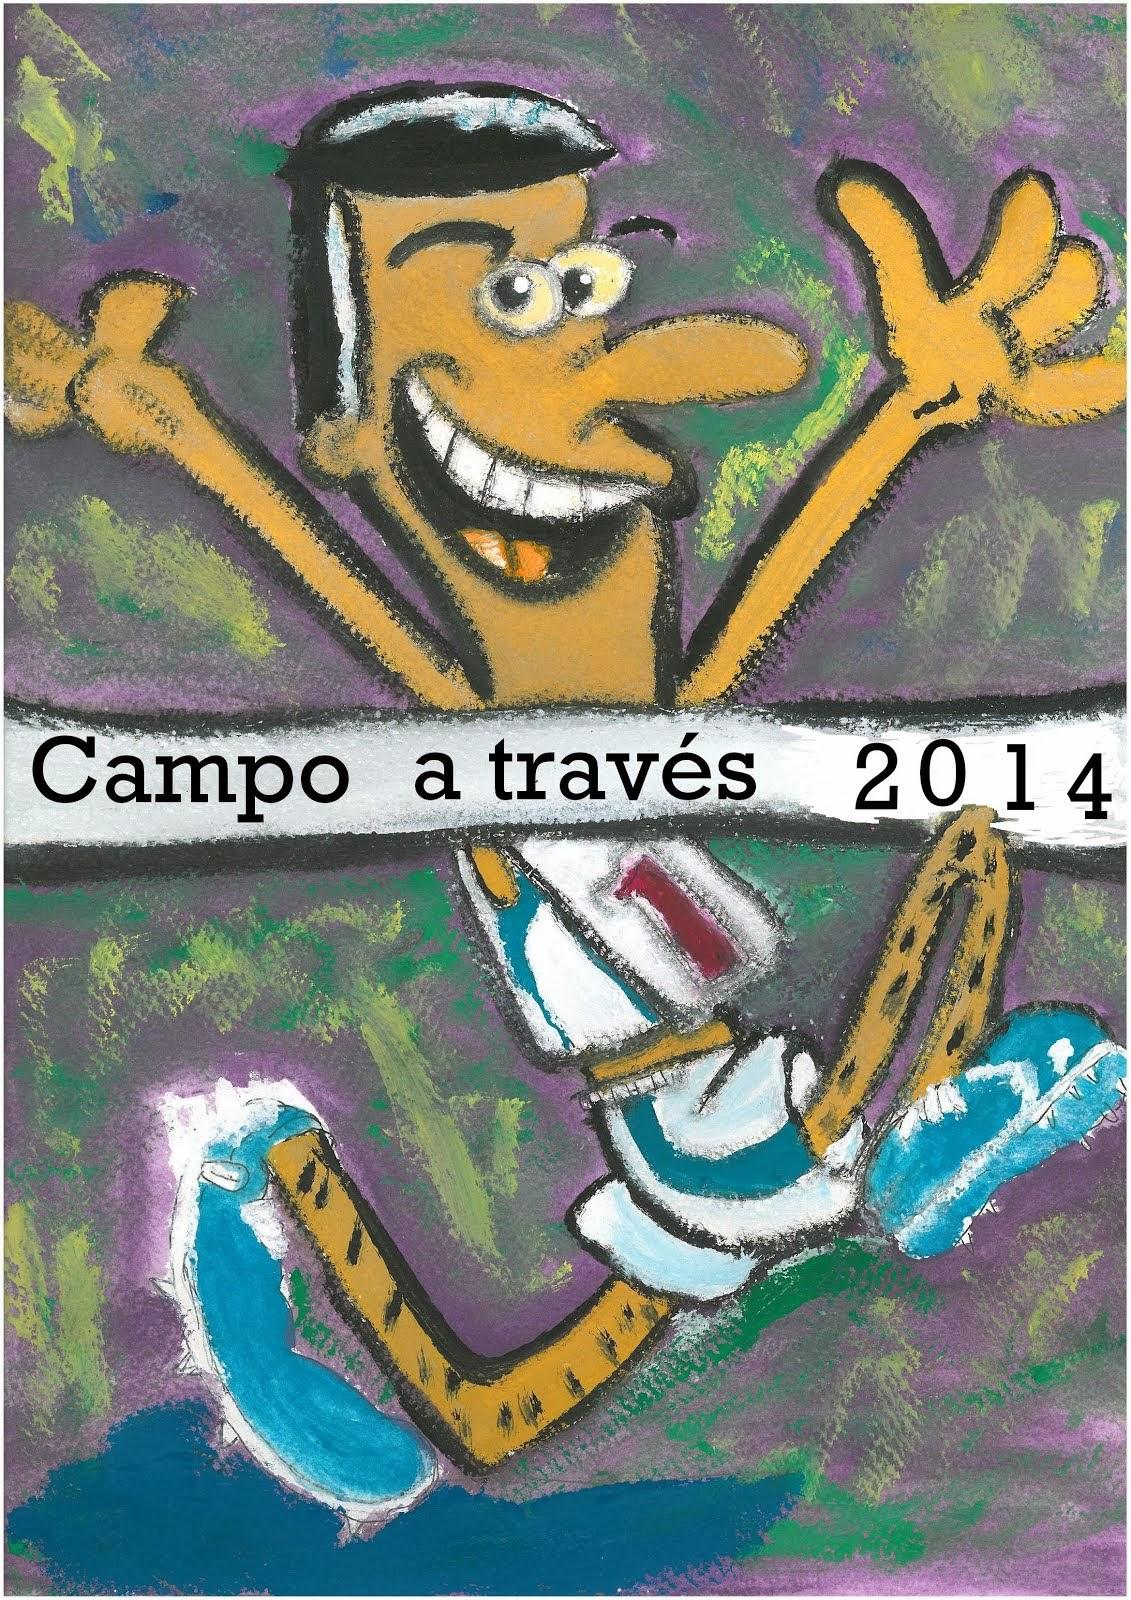 CAMPEONATO GALLEGO CAMPO A TRAVÉS 2014      A GUARDA